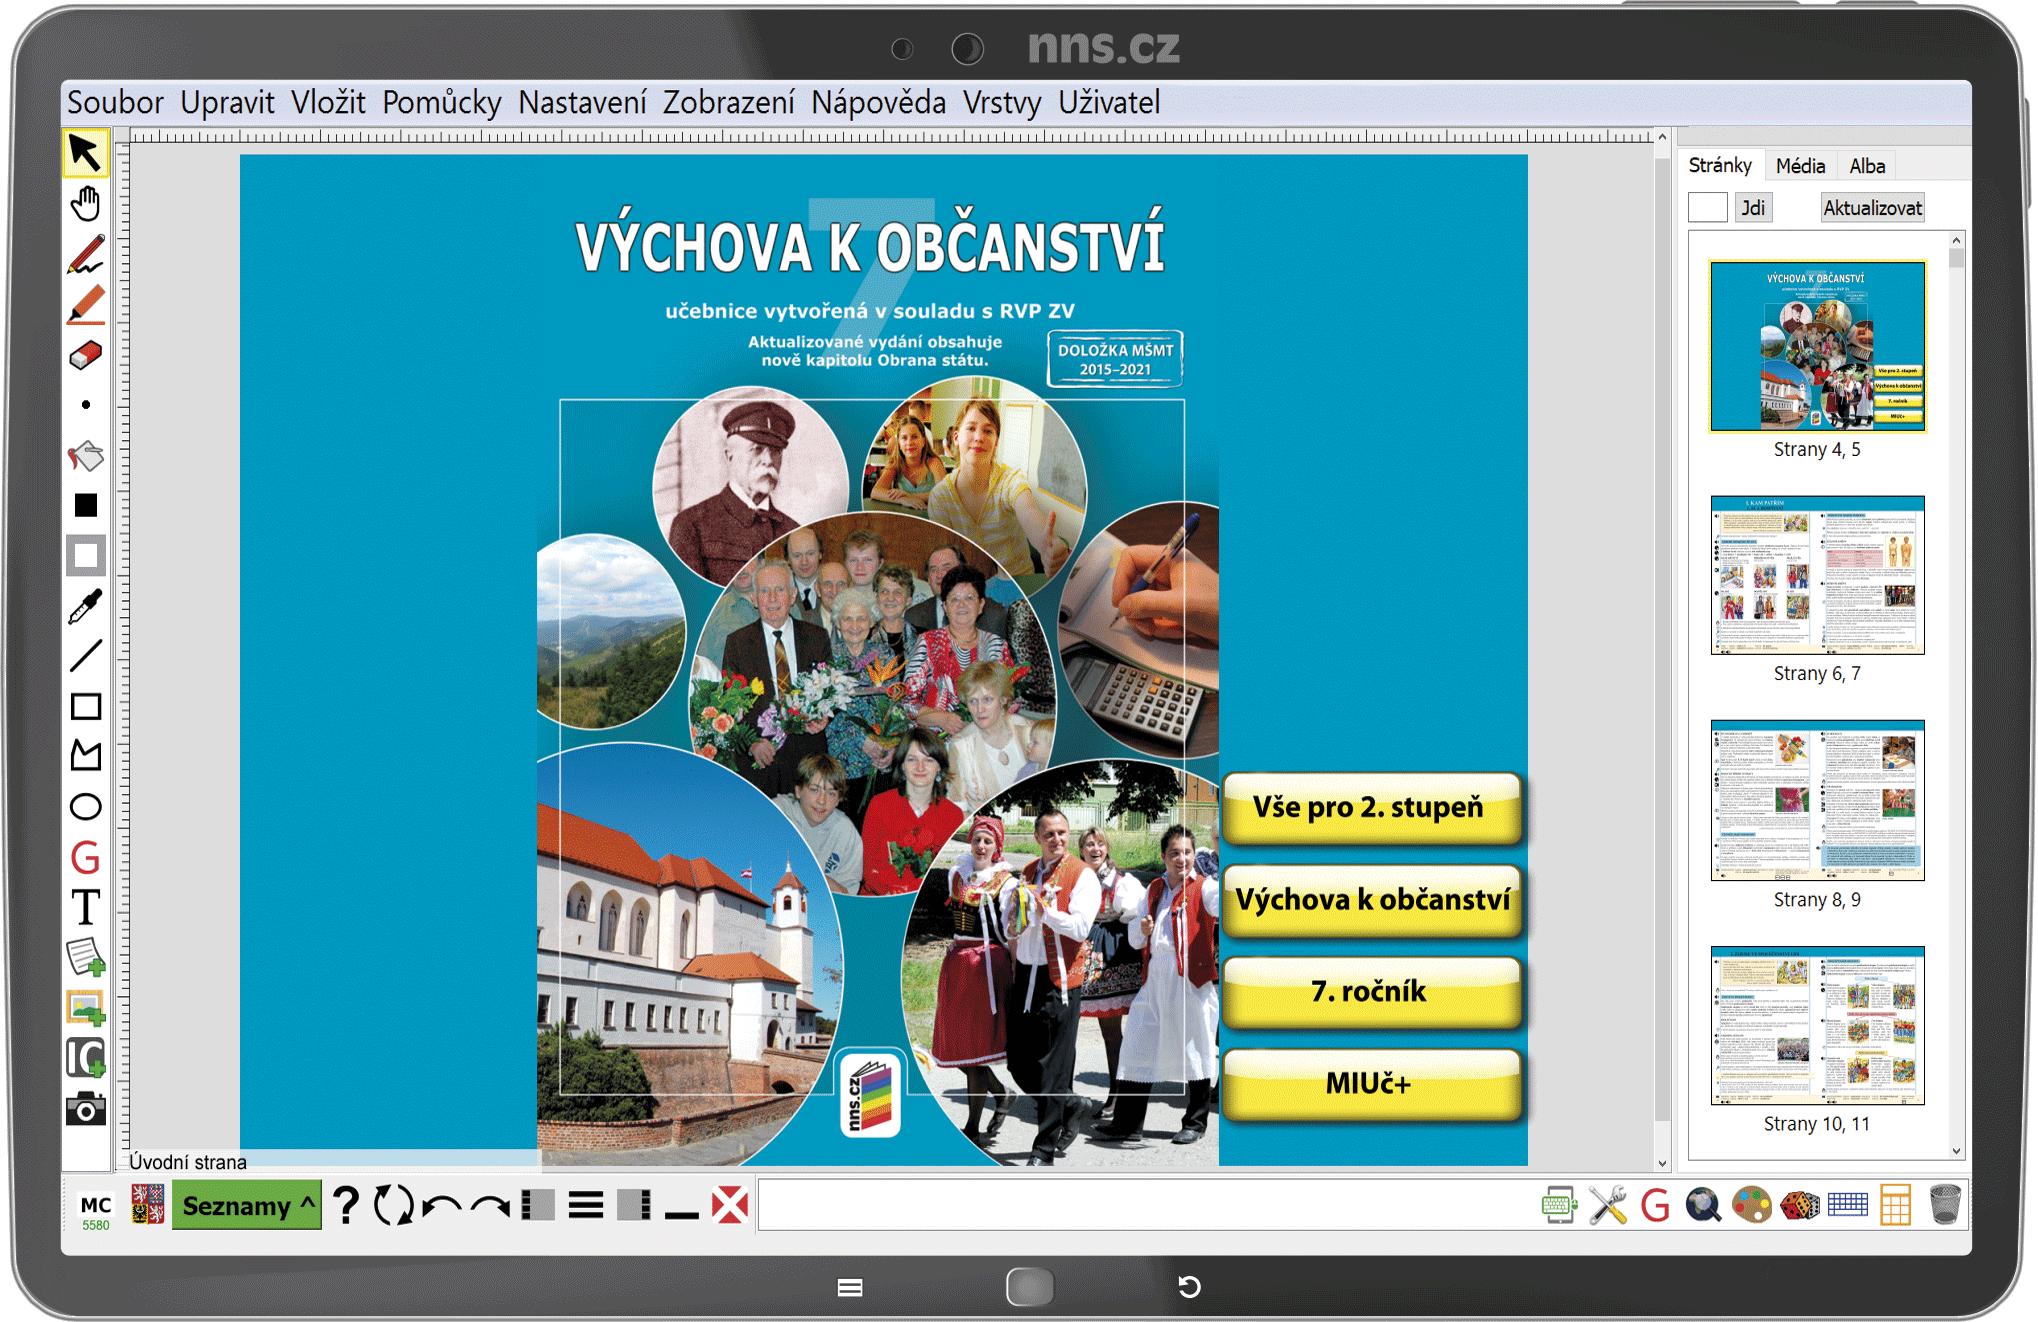 MIUč+ Výchova k občanství 7 - žák. licence na 1 šk. rok